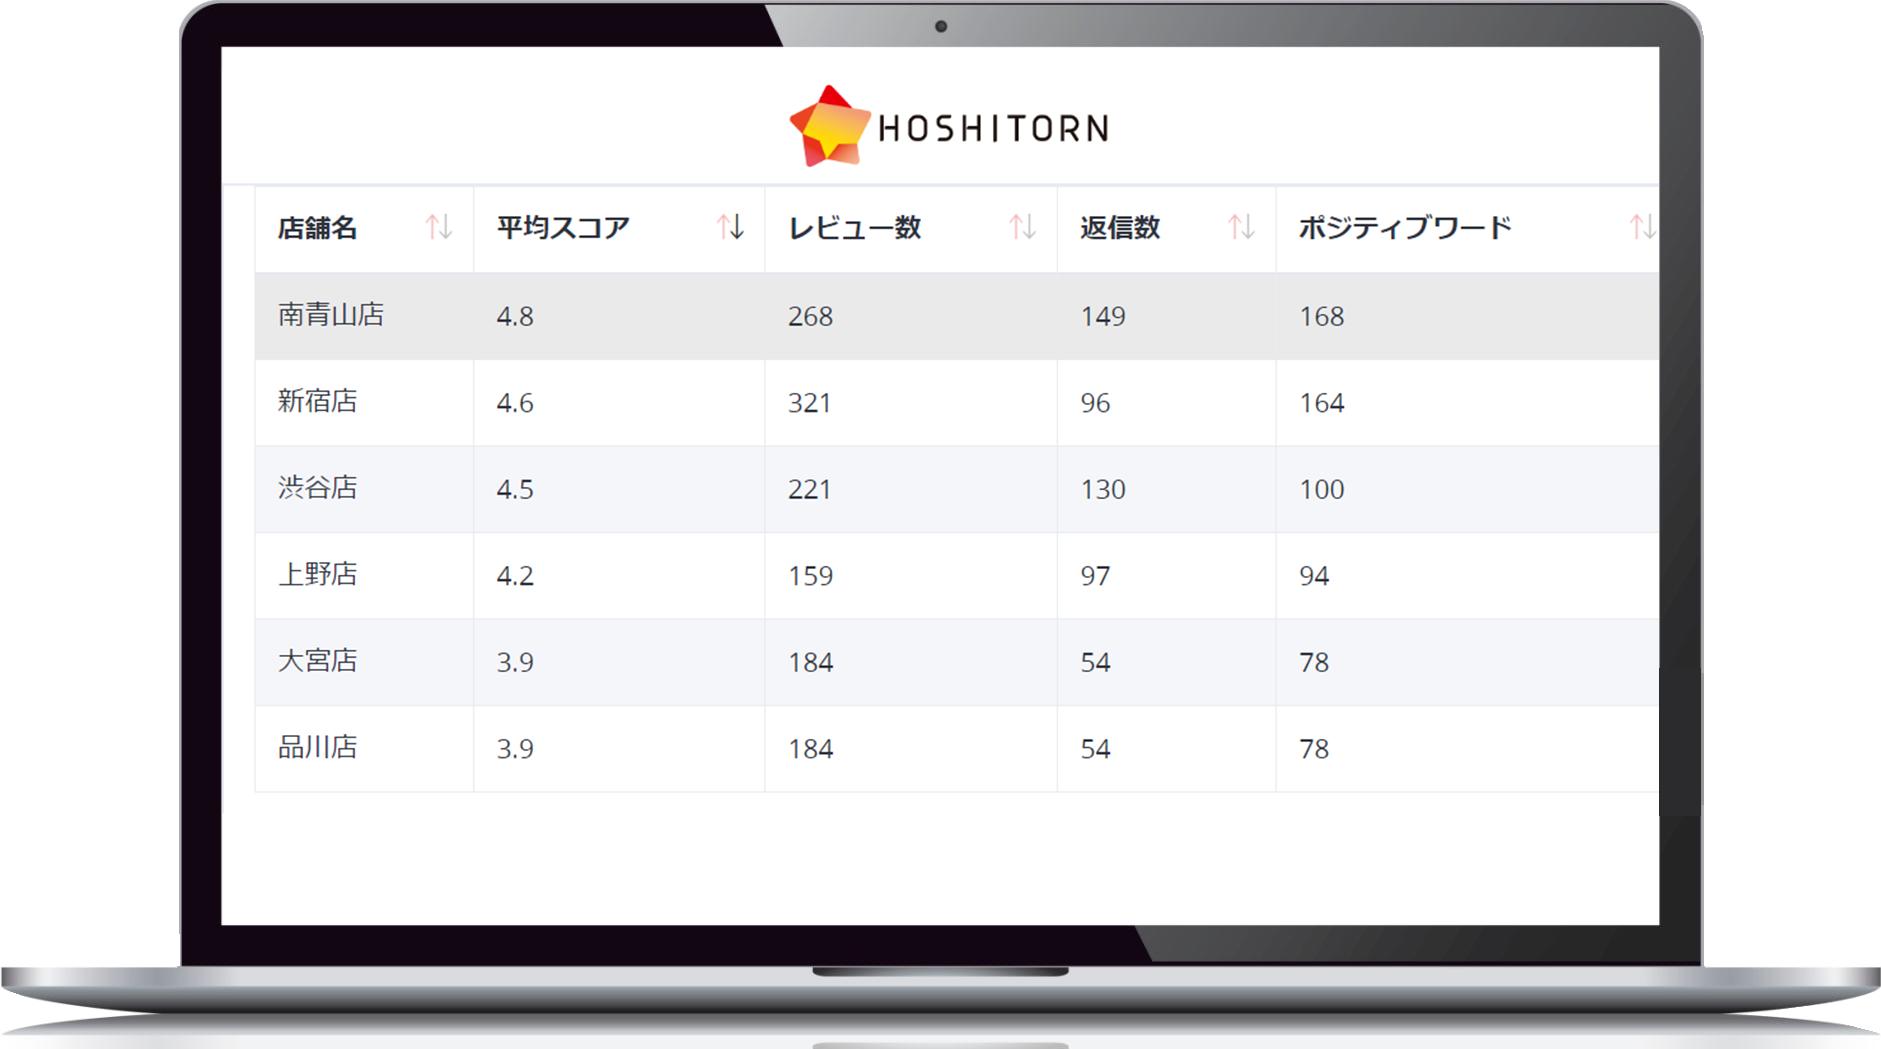 Hoshitorn